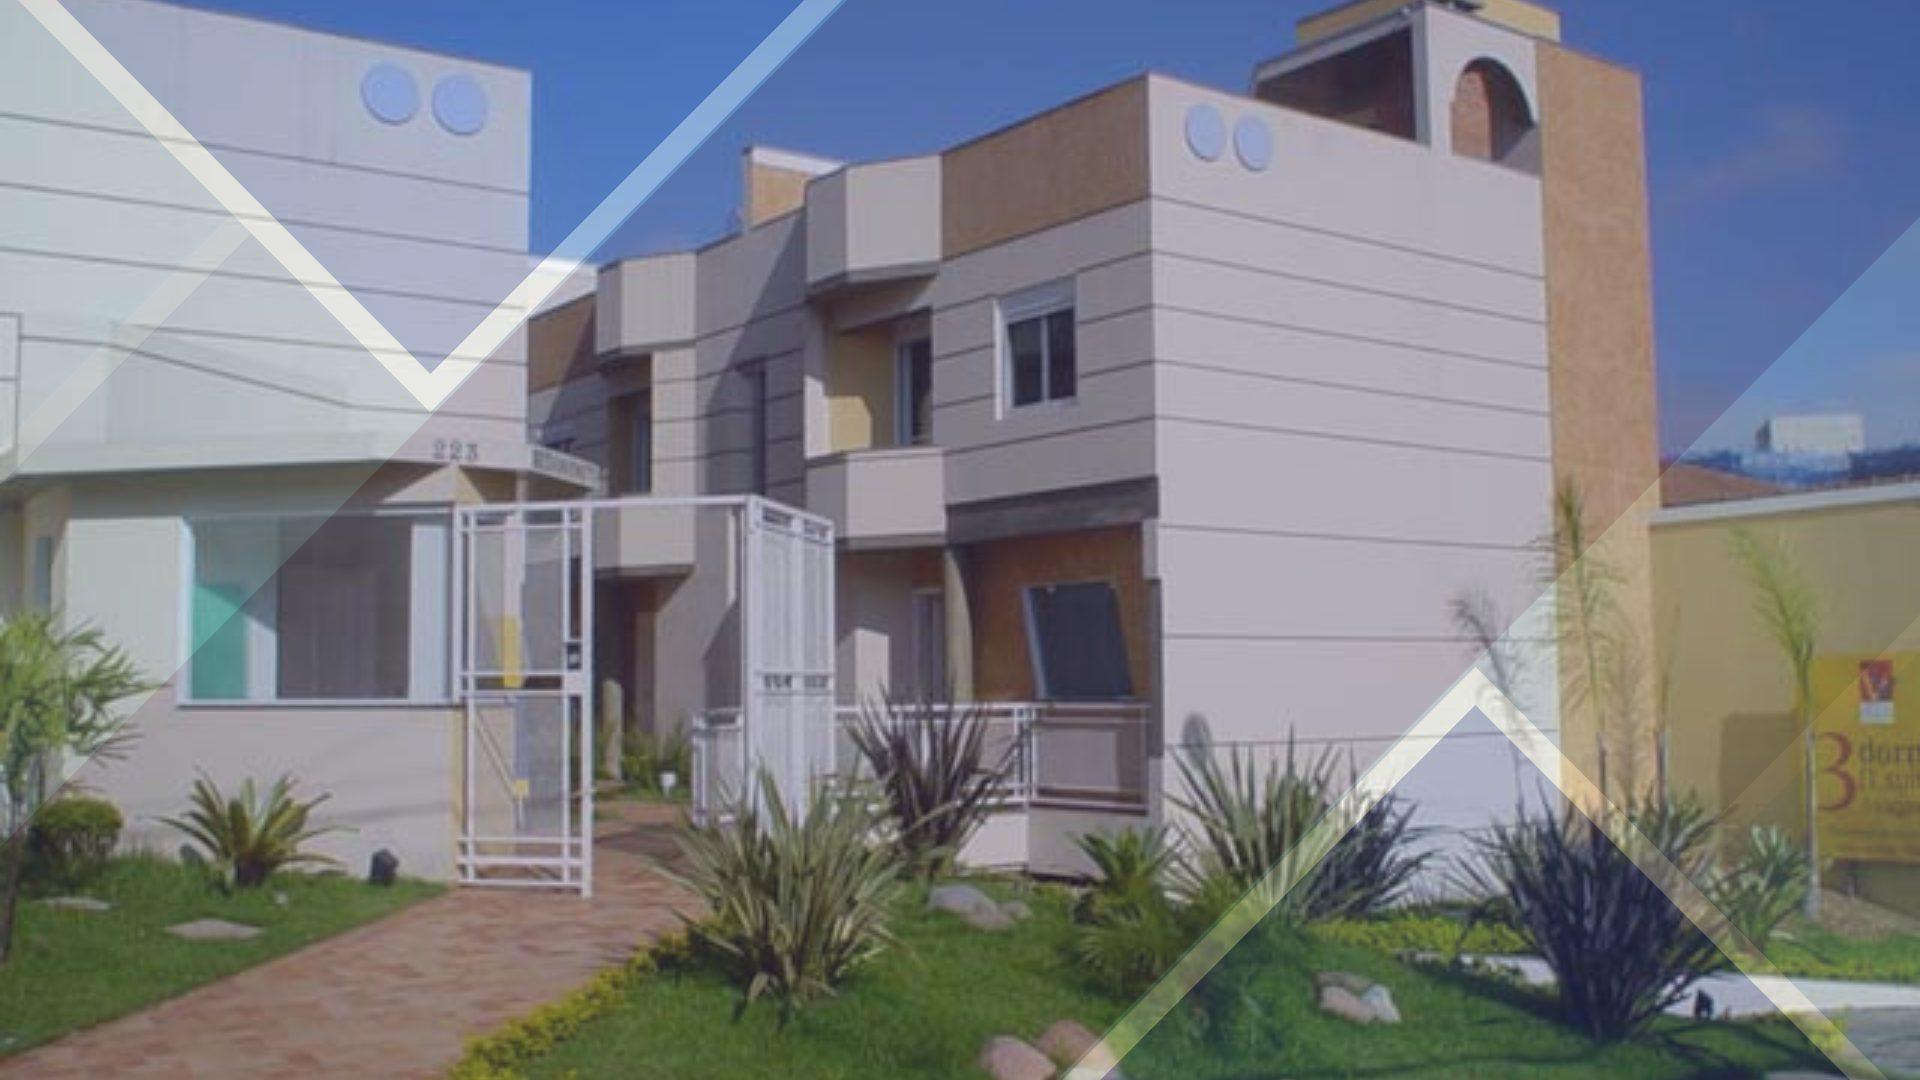 HSH Engenharia - Via Veneto